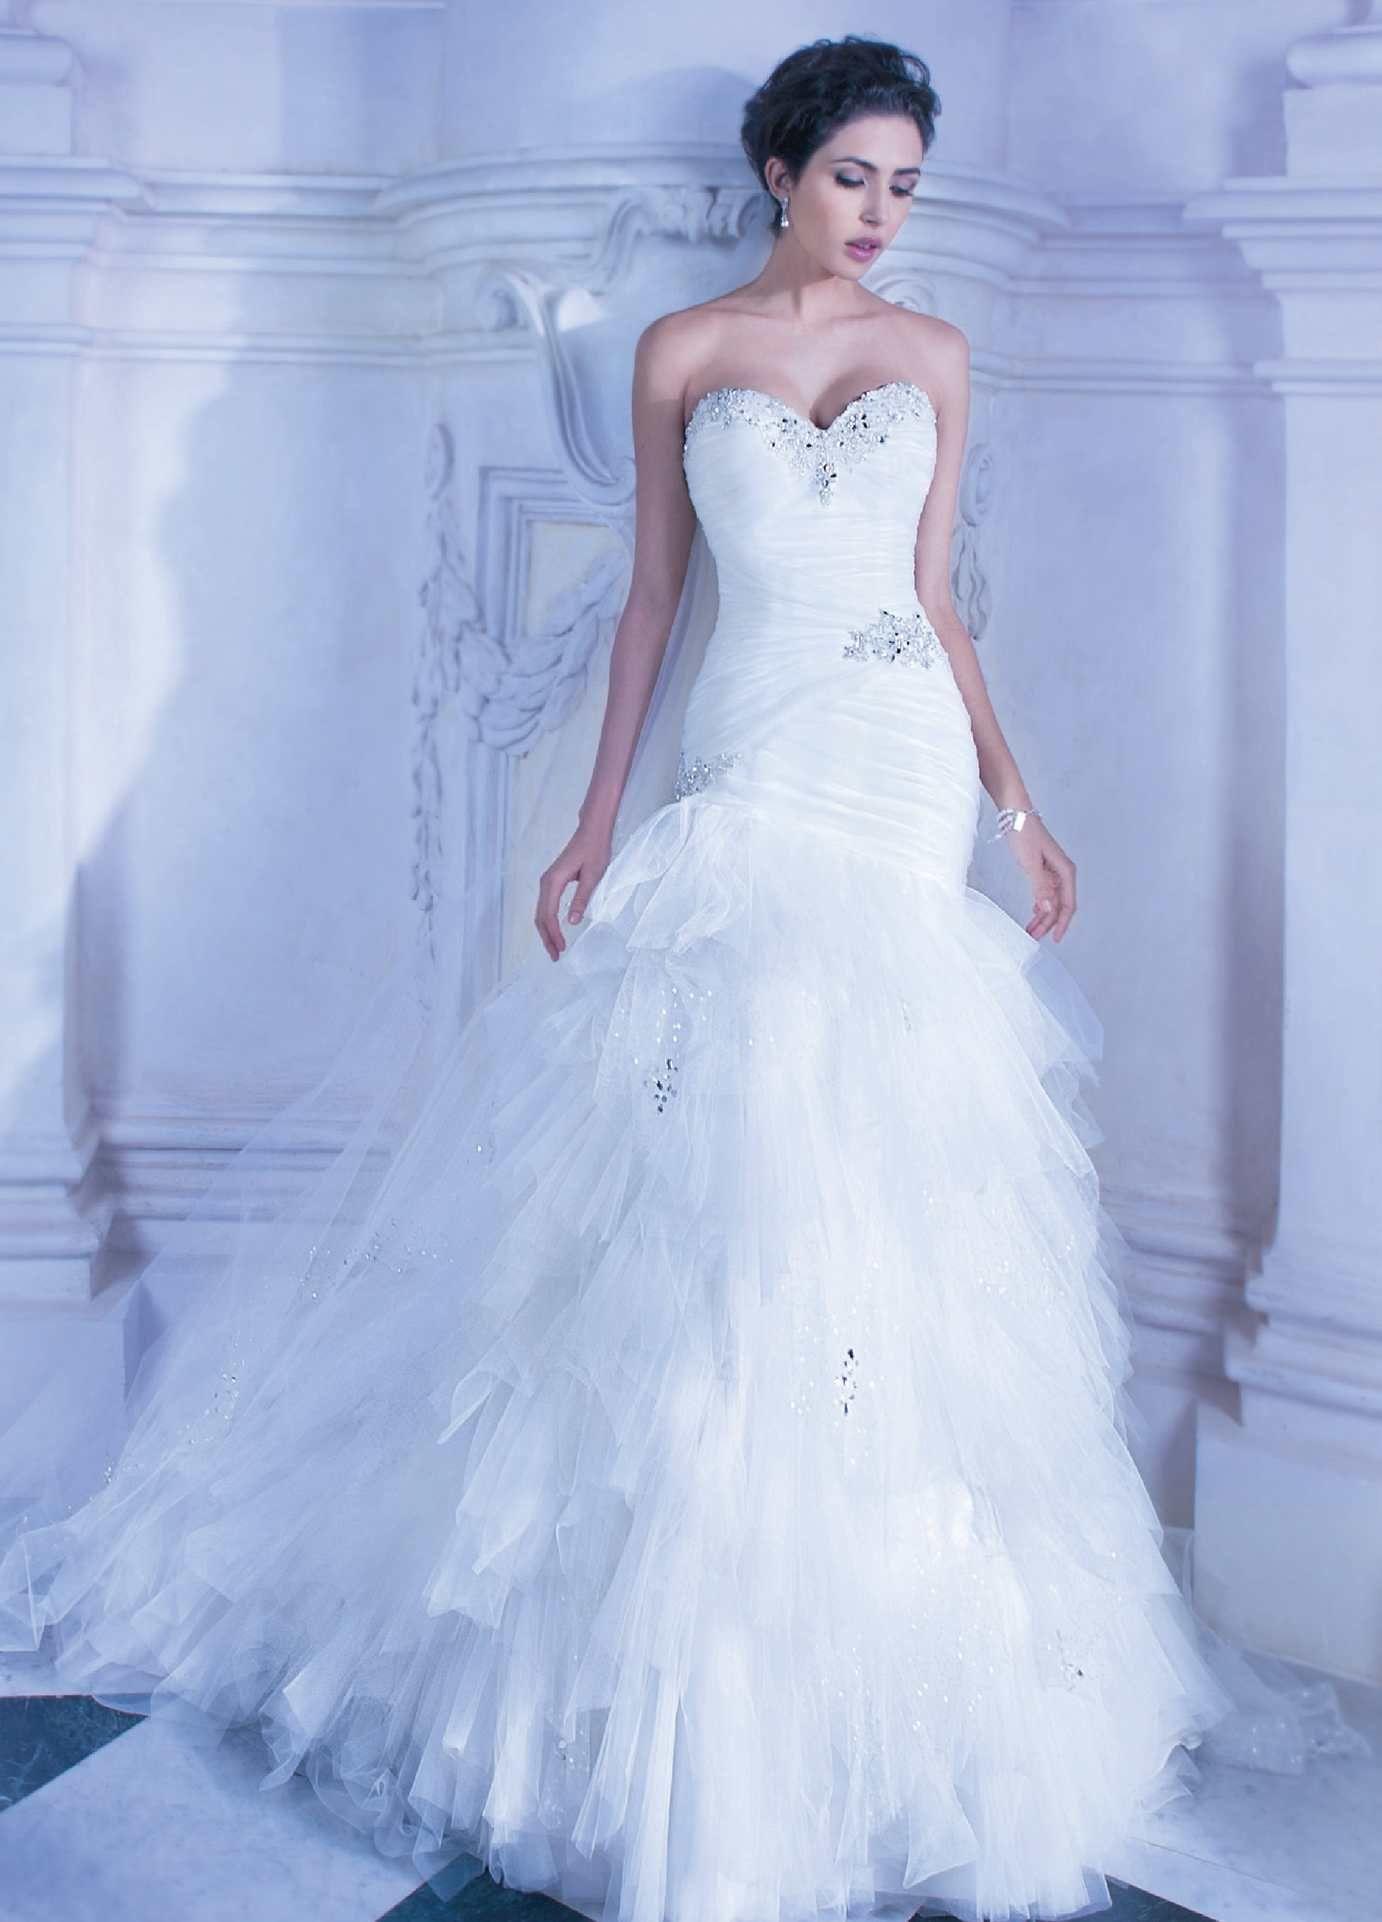 Demetrios 2014 Tendance robe de mariée, Robes de mariée